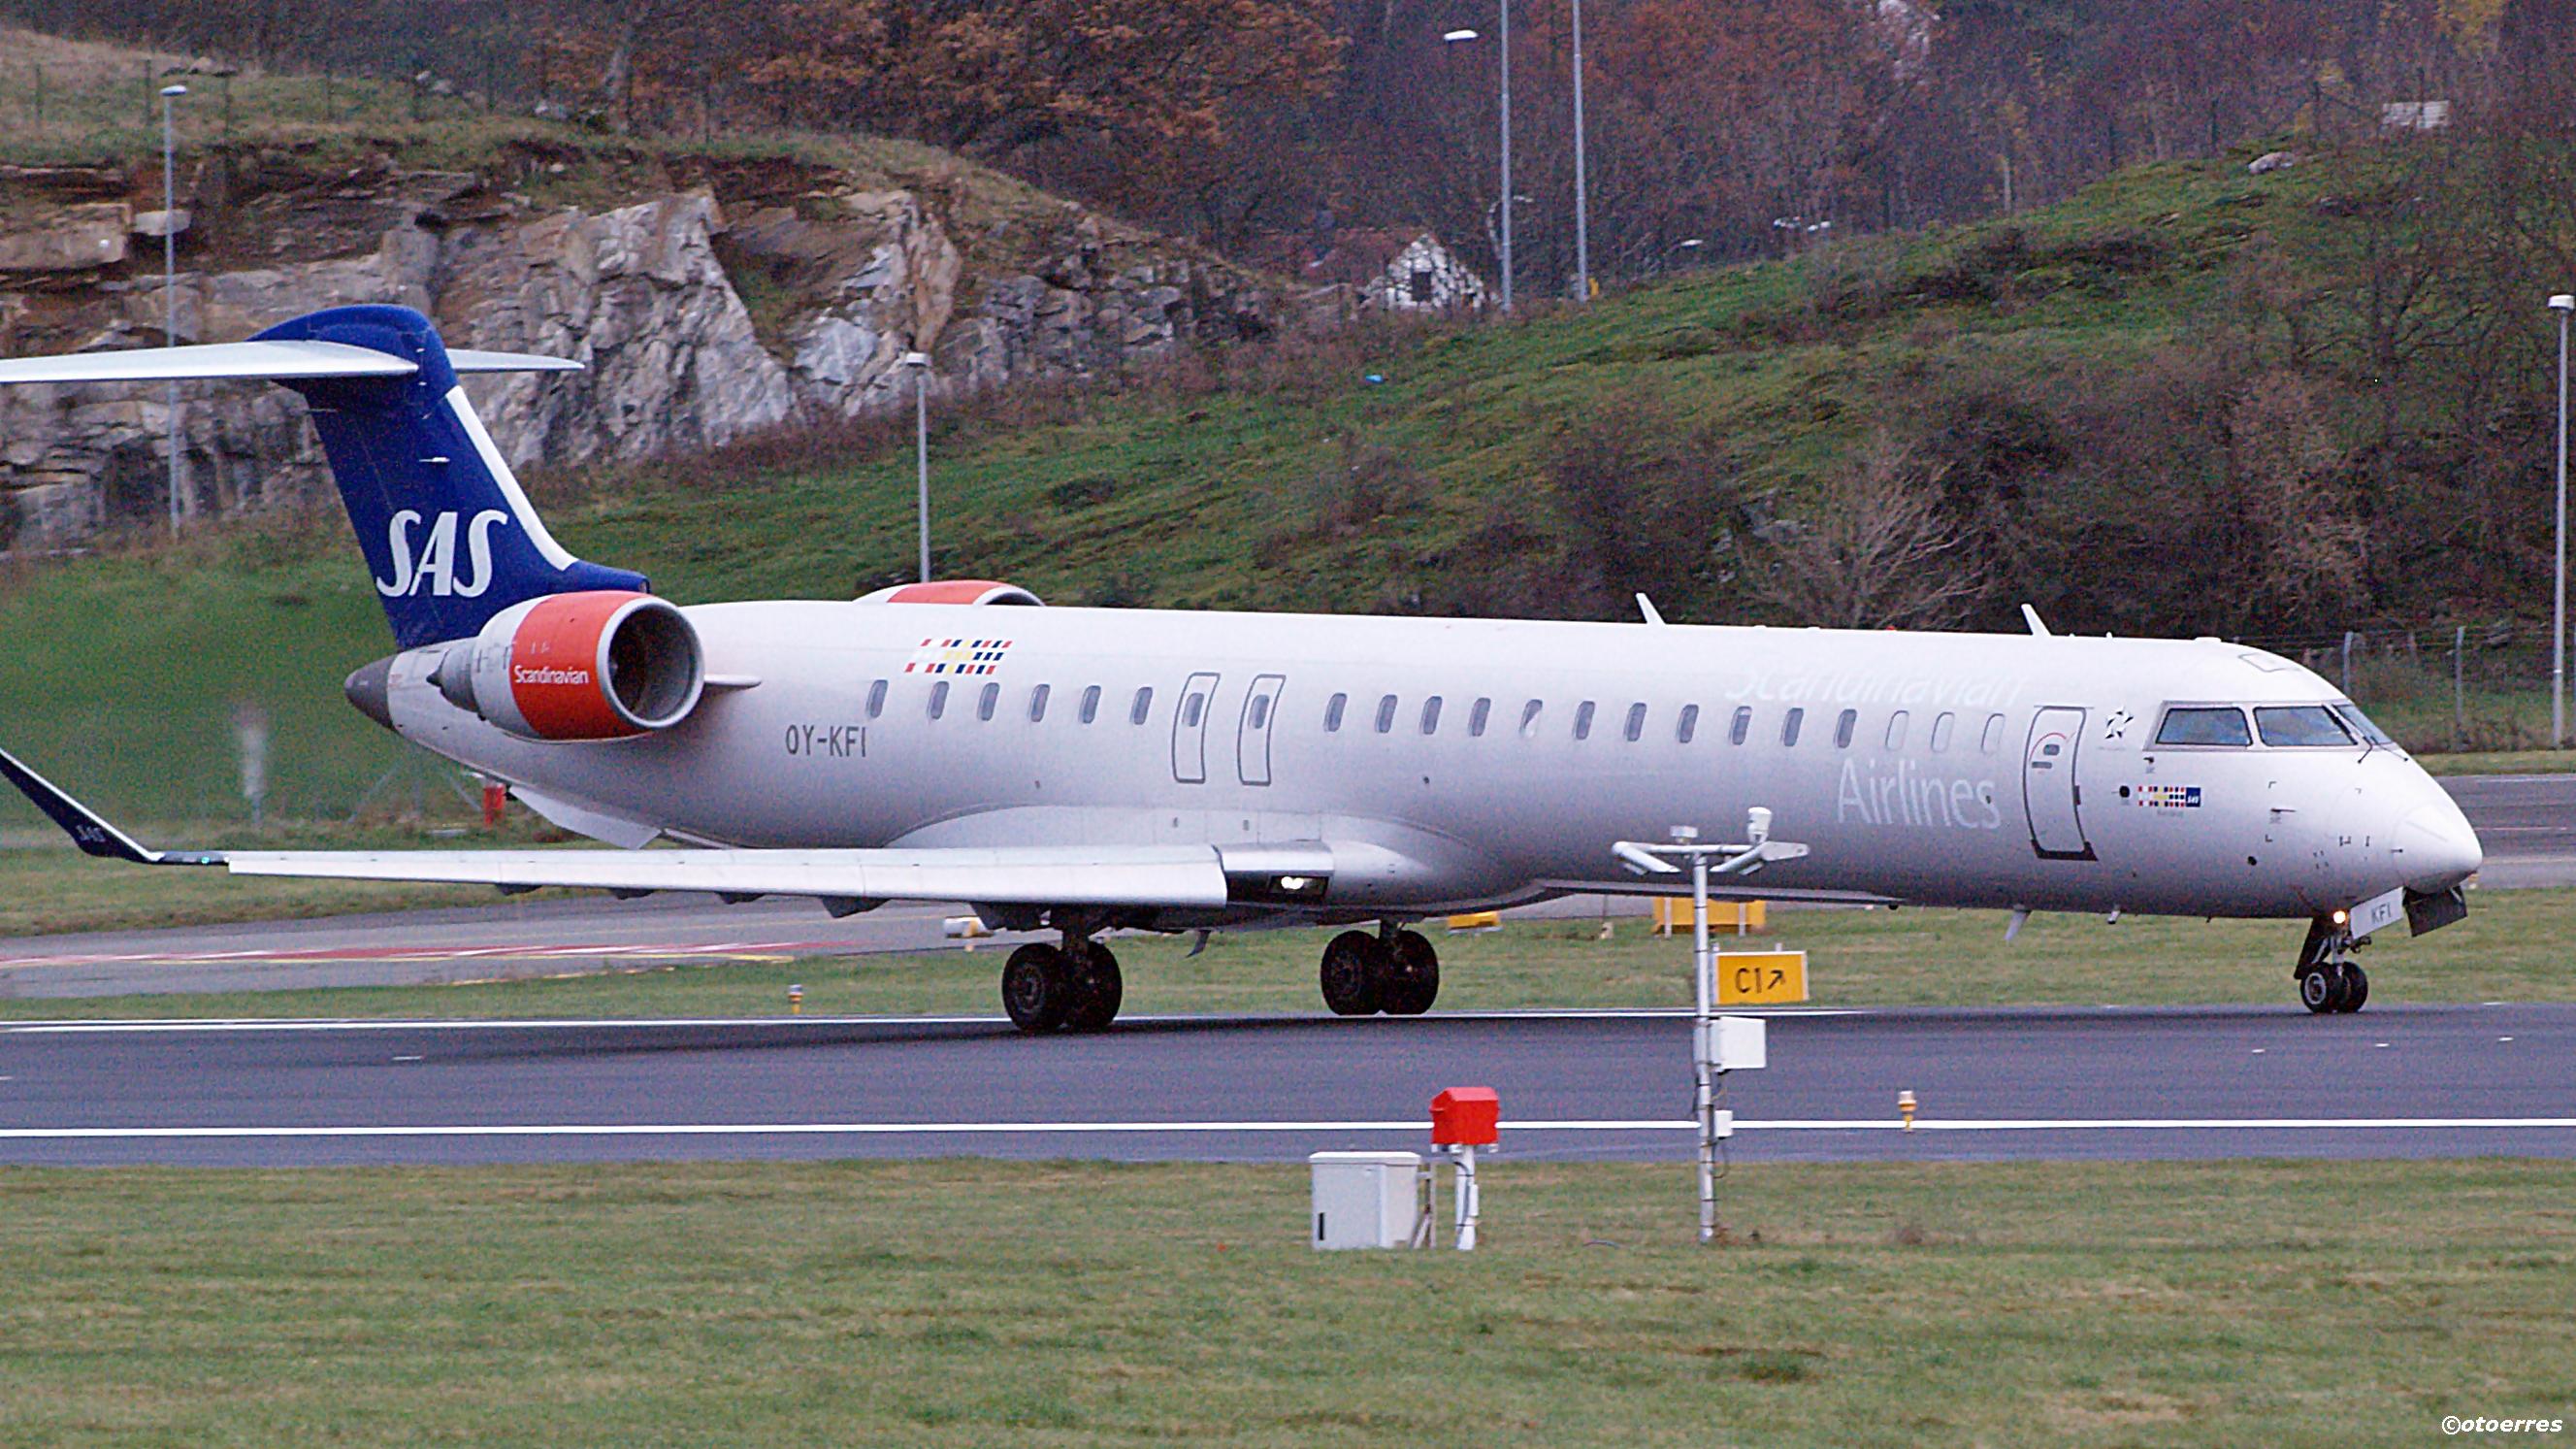 SAS - Bombardier CRJ 900 - Sola - 2014